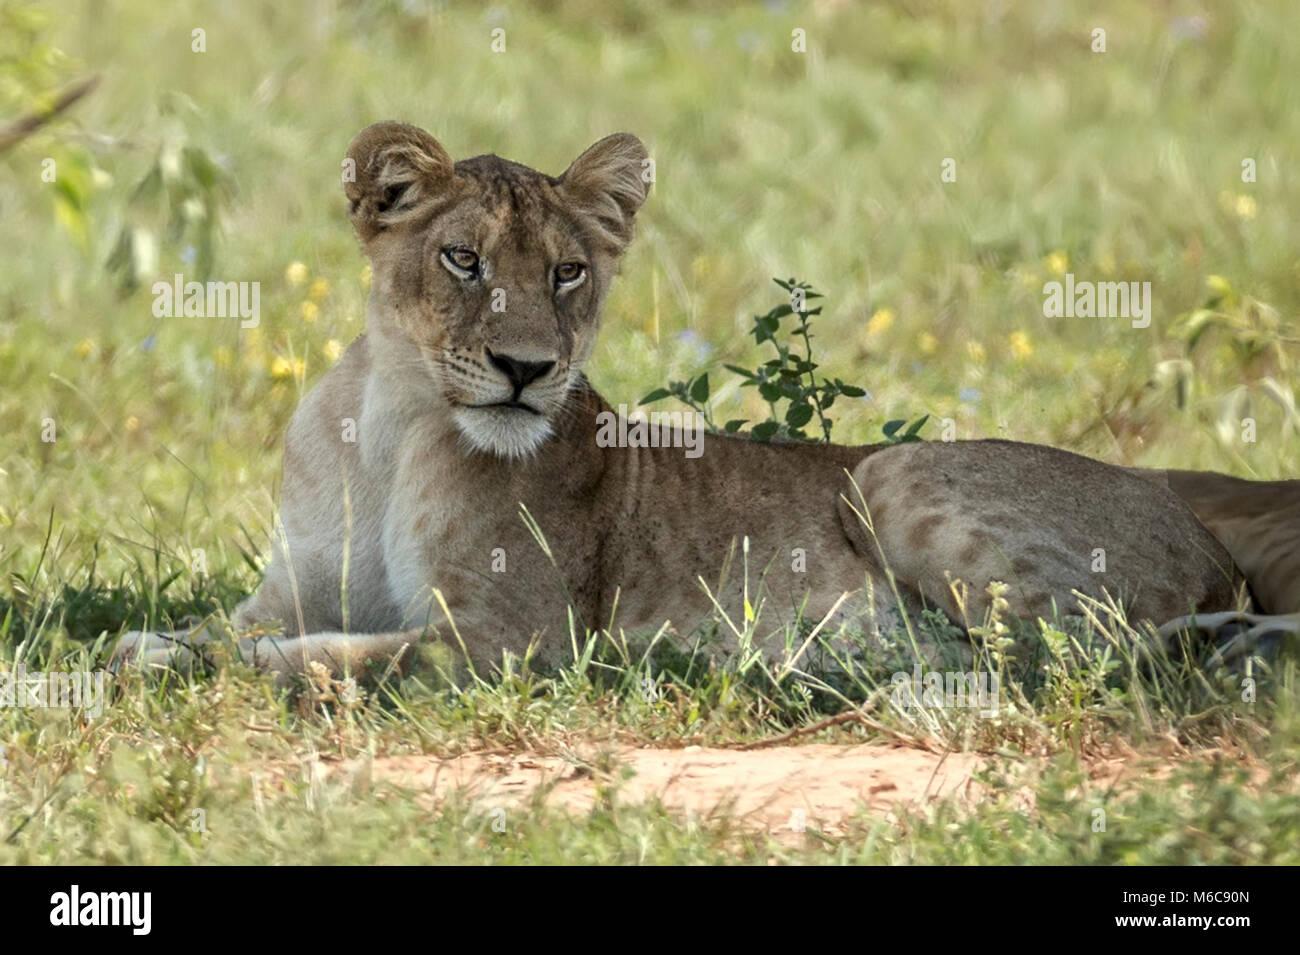 Lioness 'Murchison's Falls National Park', Uganda, Africa - Stock Image